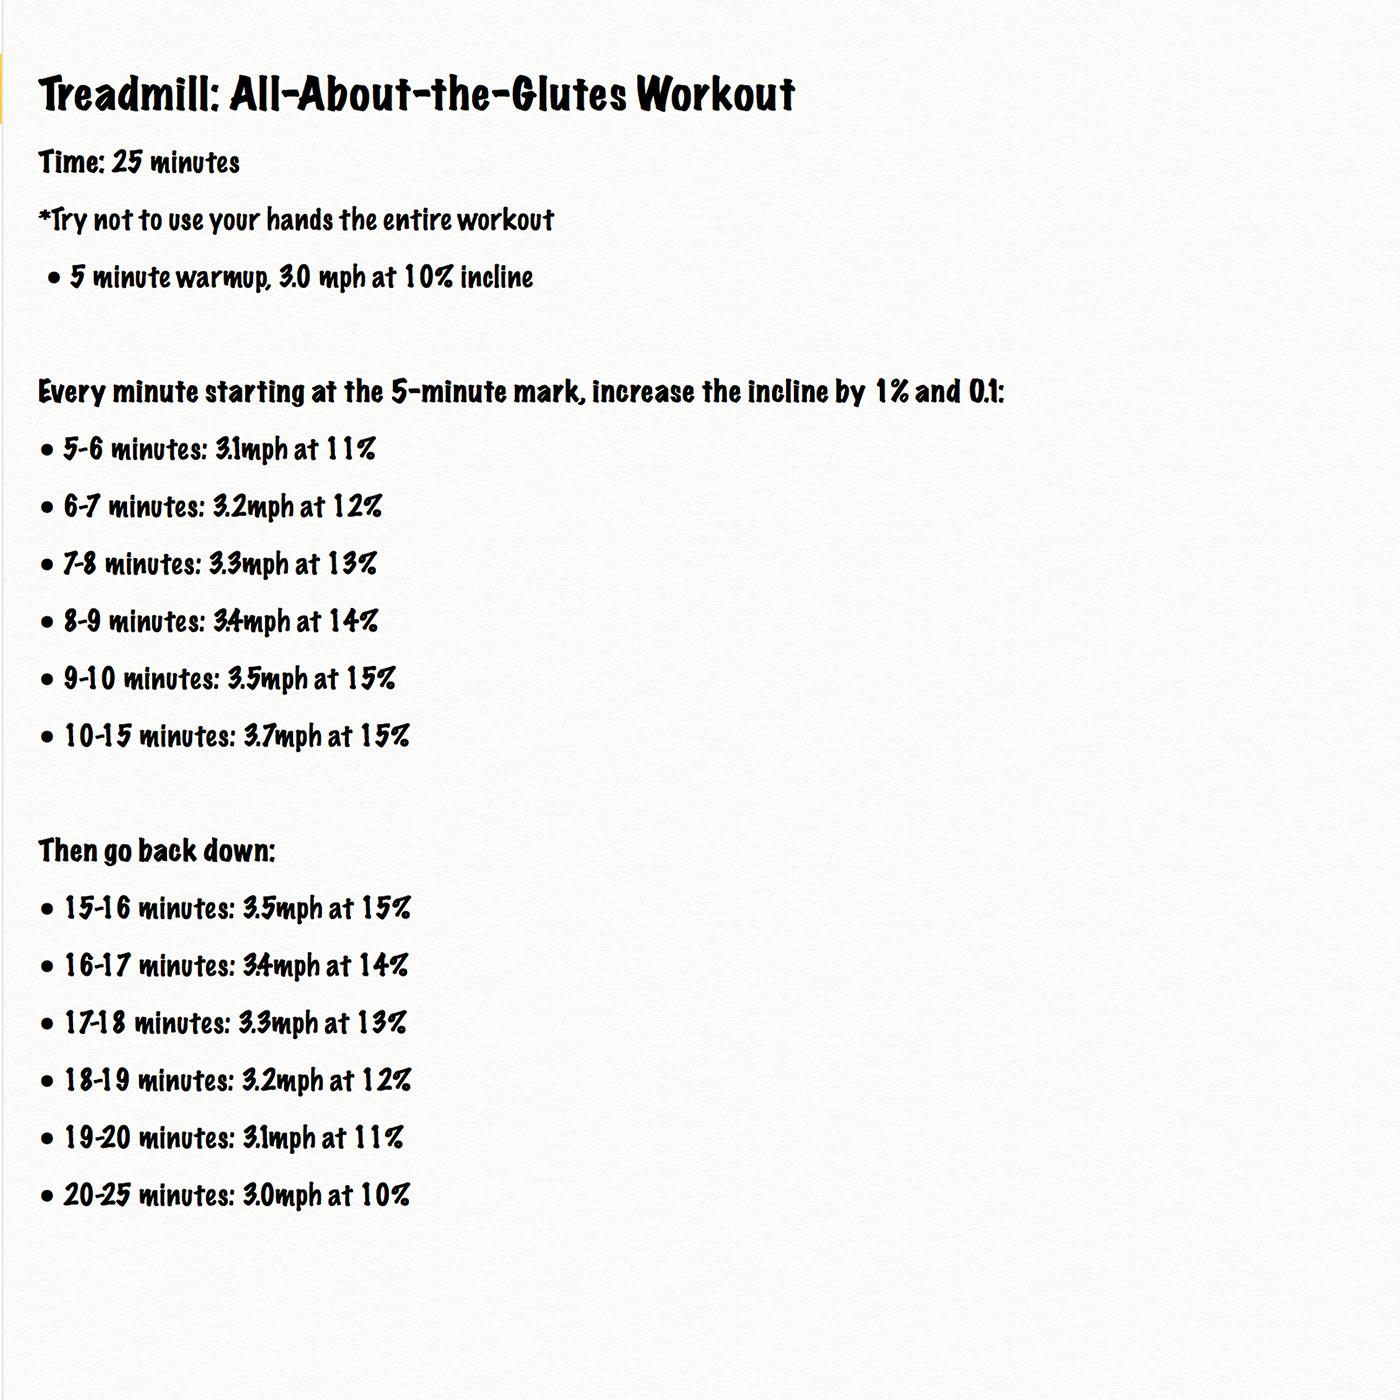 treadmillglutesworkout